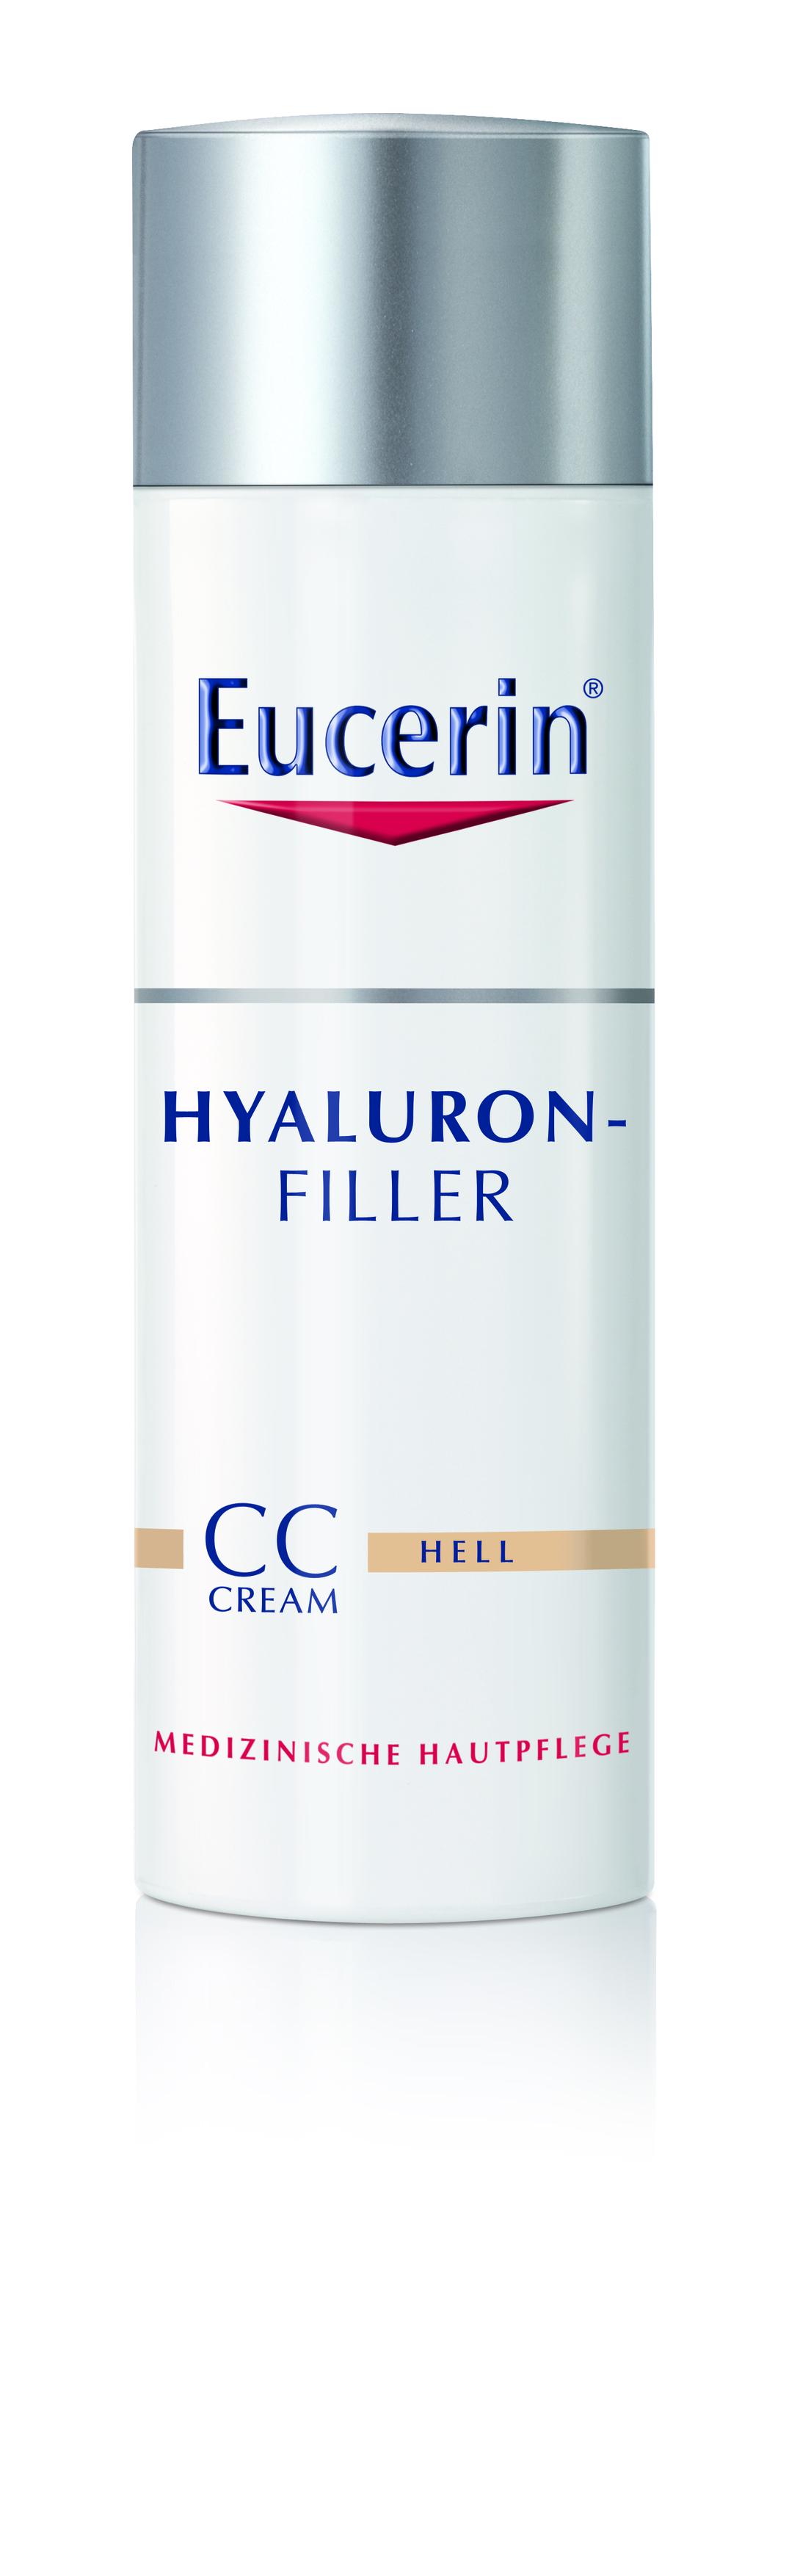 hyaluron-filler-cc-vilagos.jpg